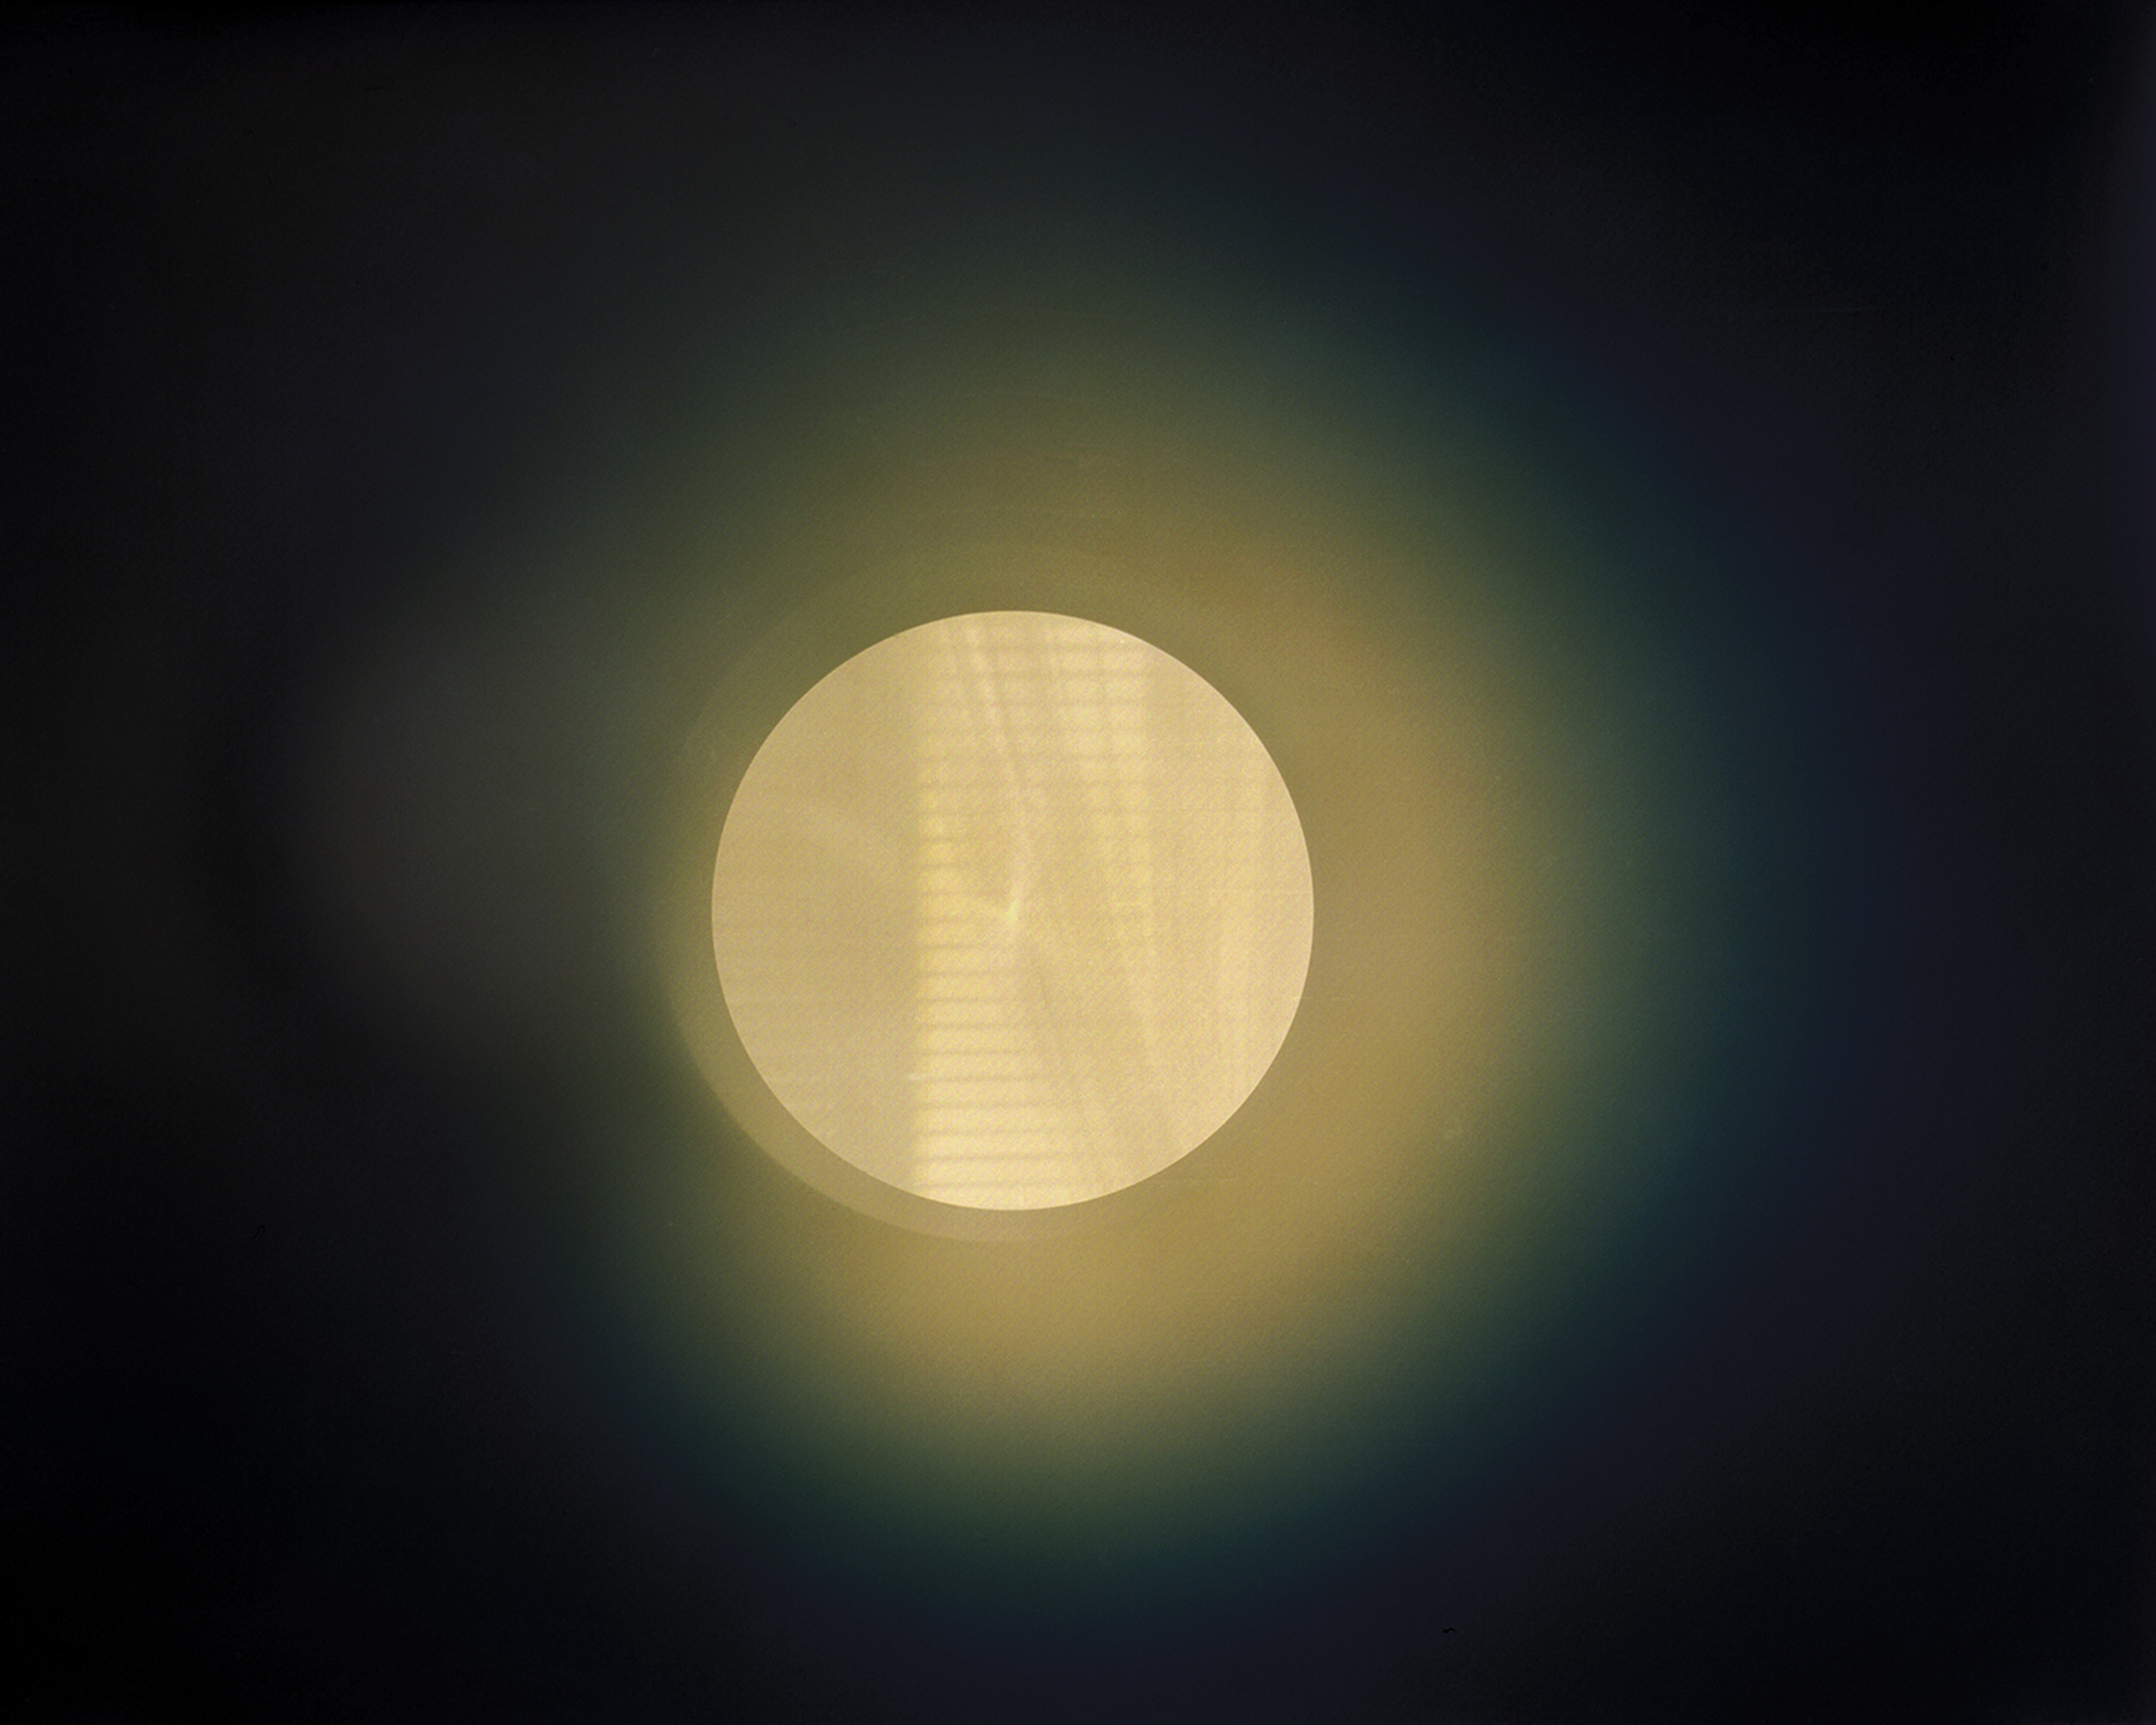 Bedroom Window (6:55 – 7:07 AM, January 1, 2013)